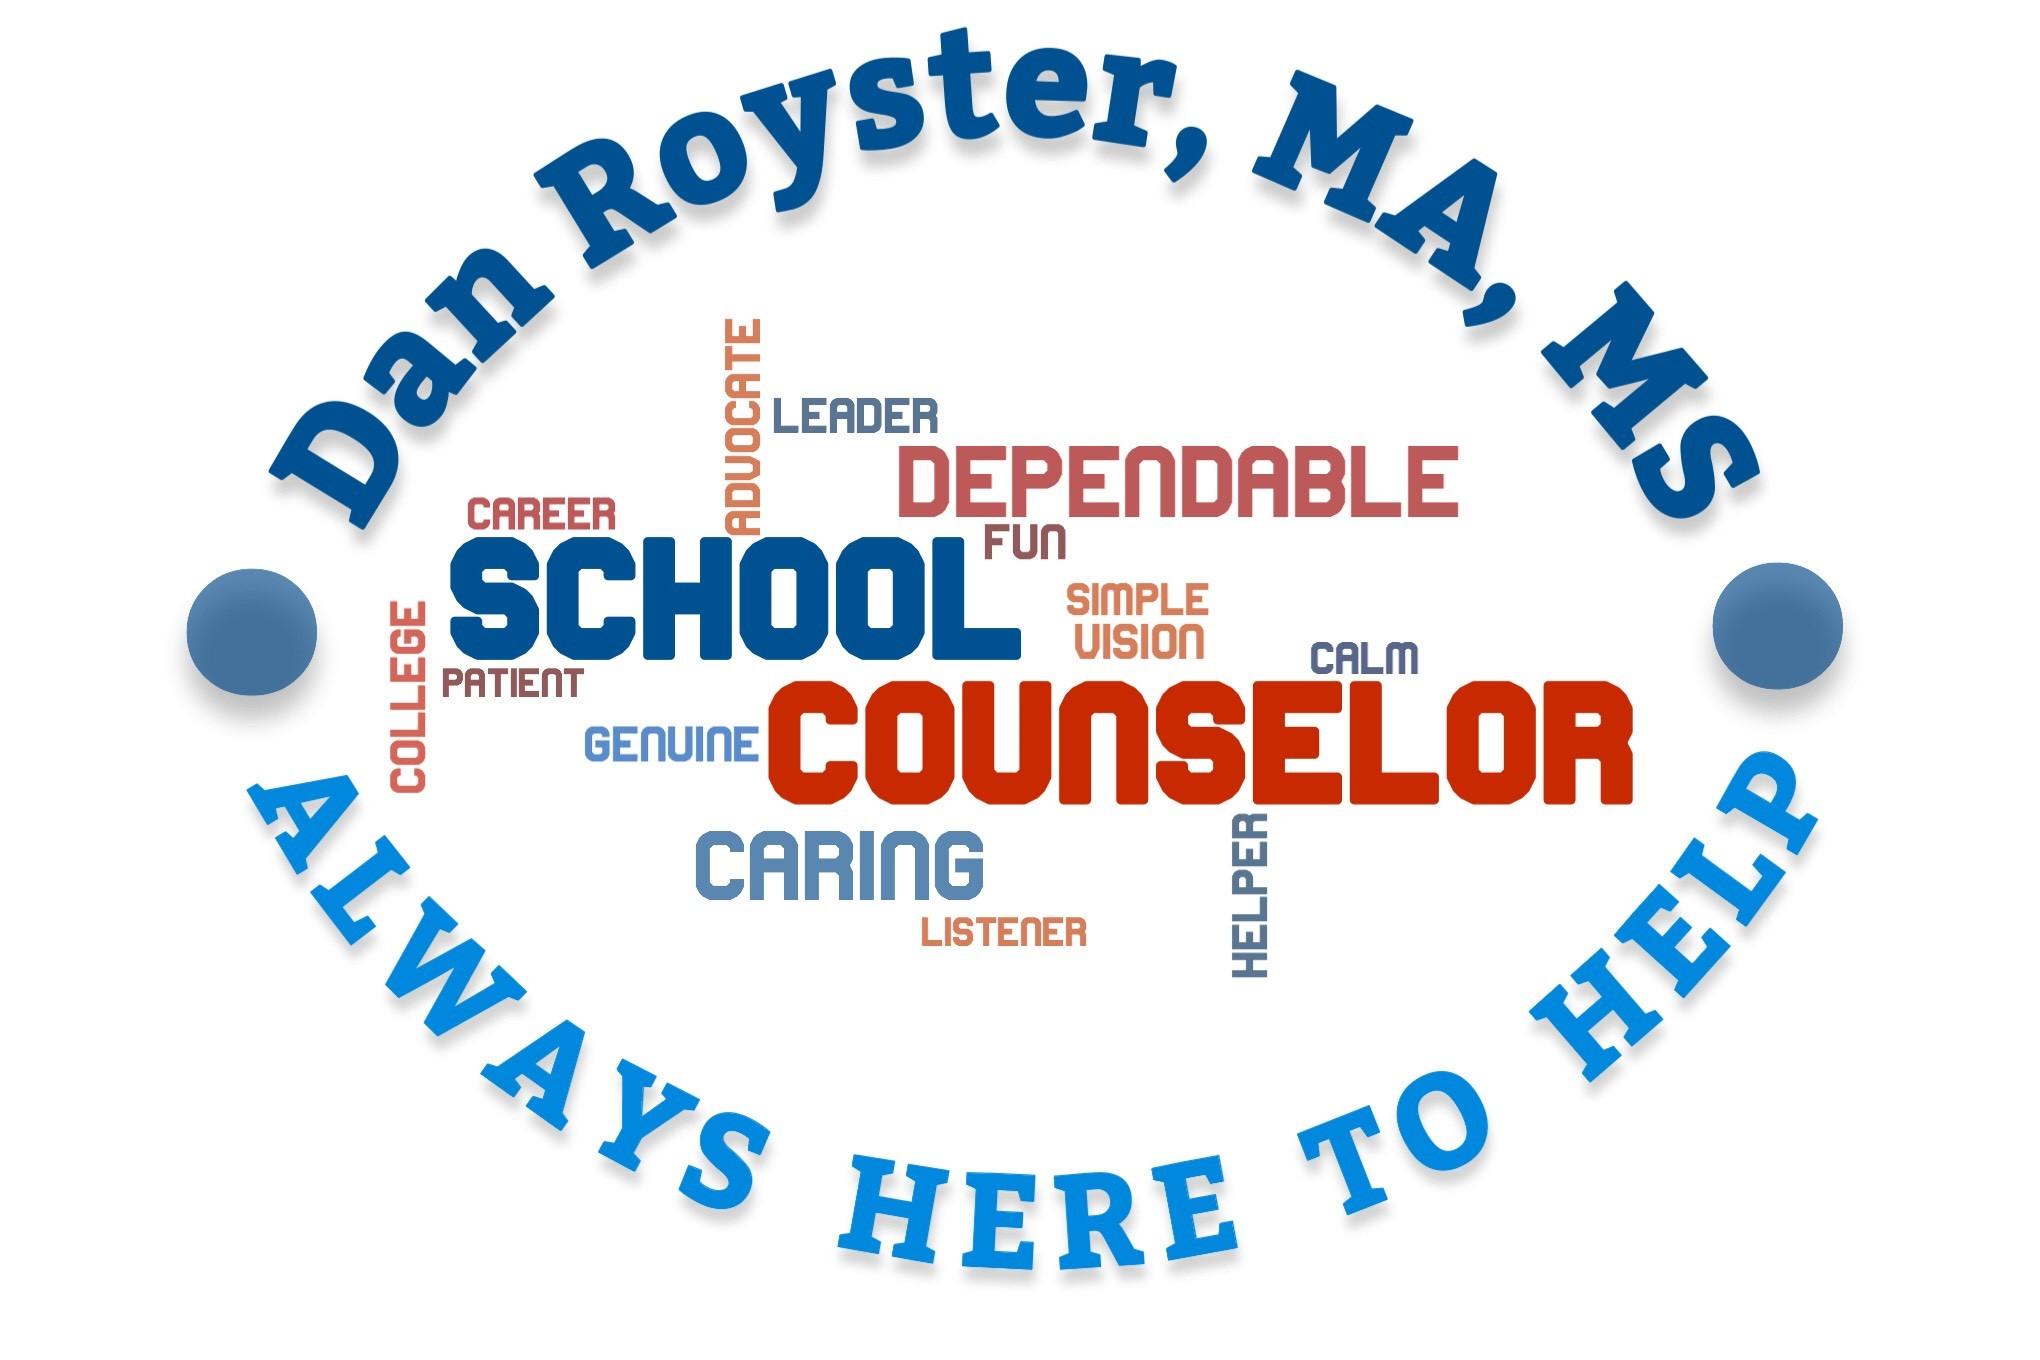 Dan Royster Ma Ms School Counseling